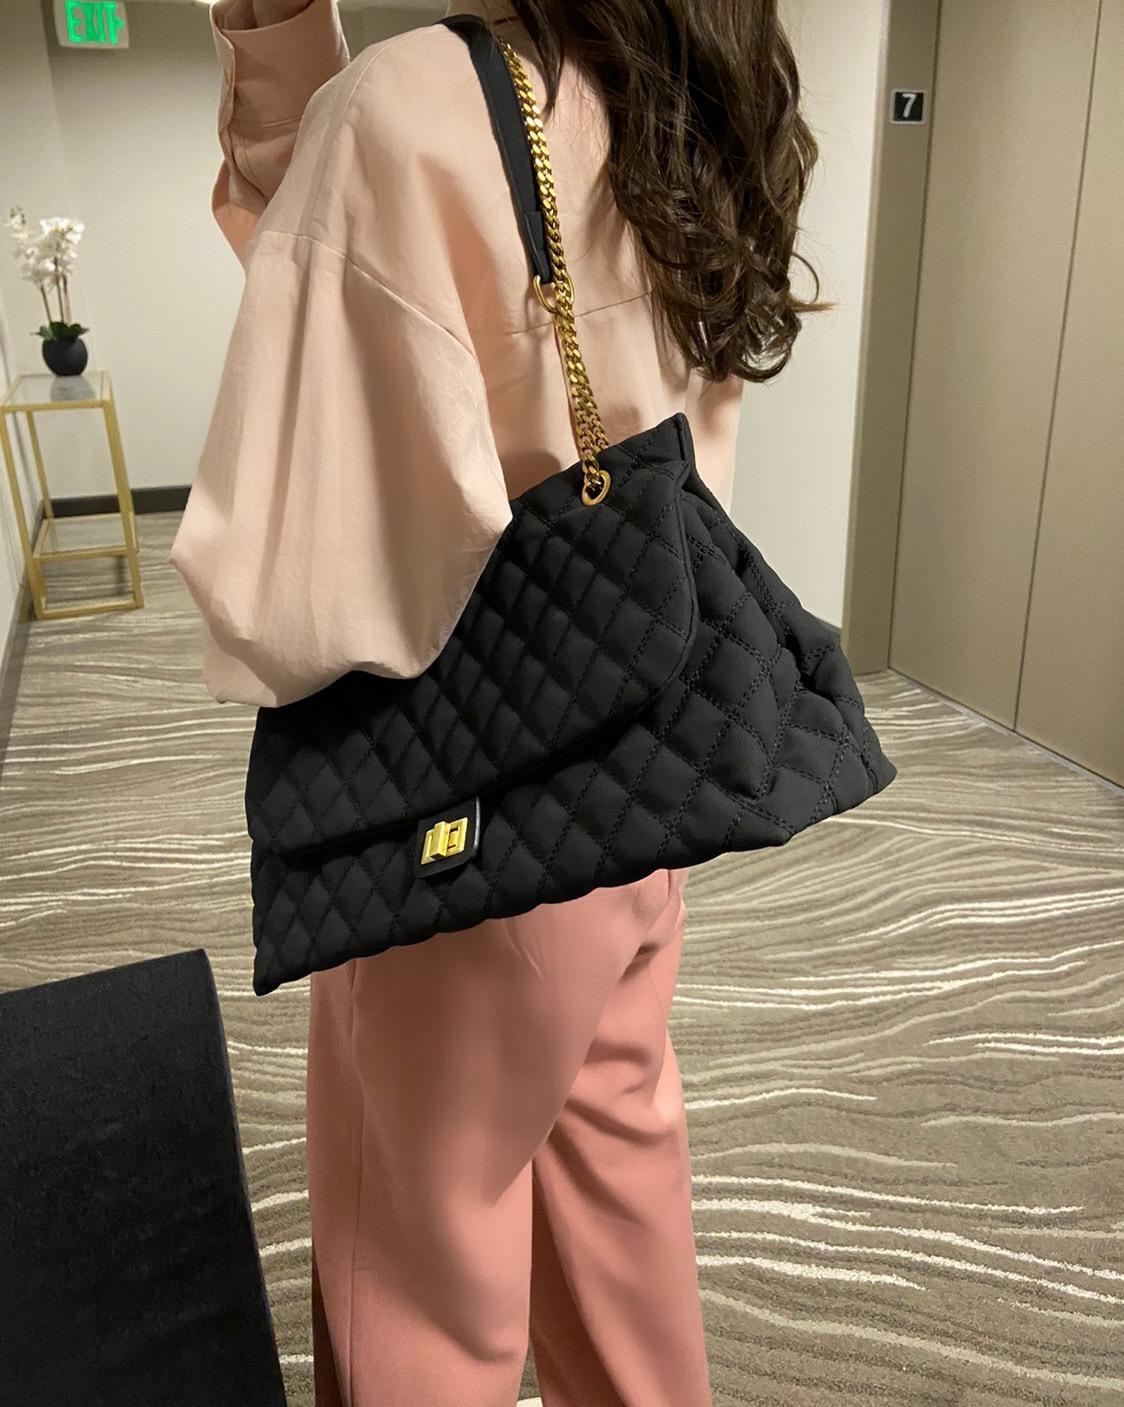 DAYNYC classic cross bag